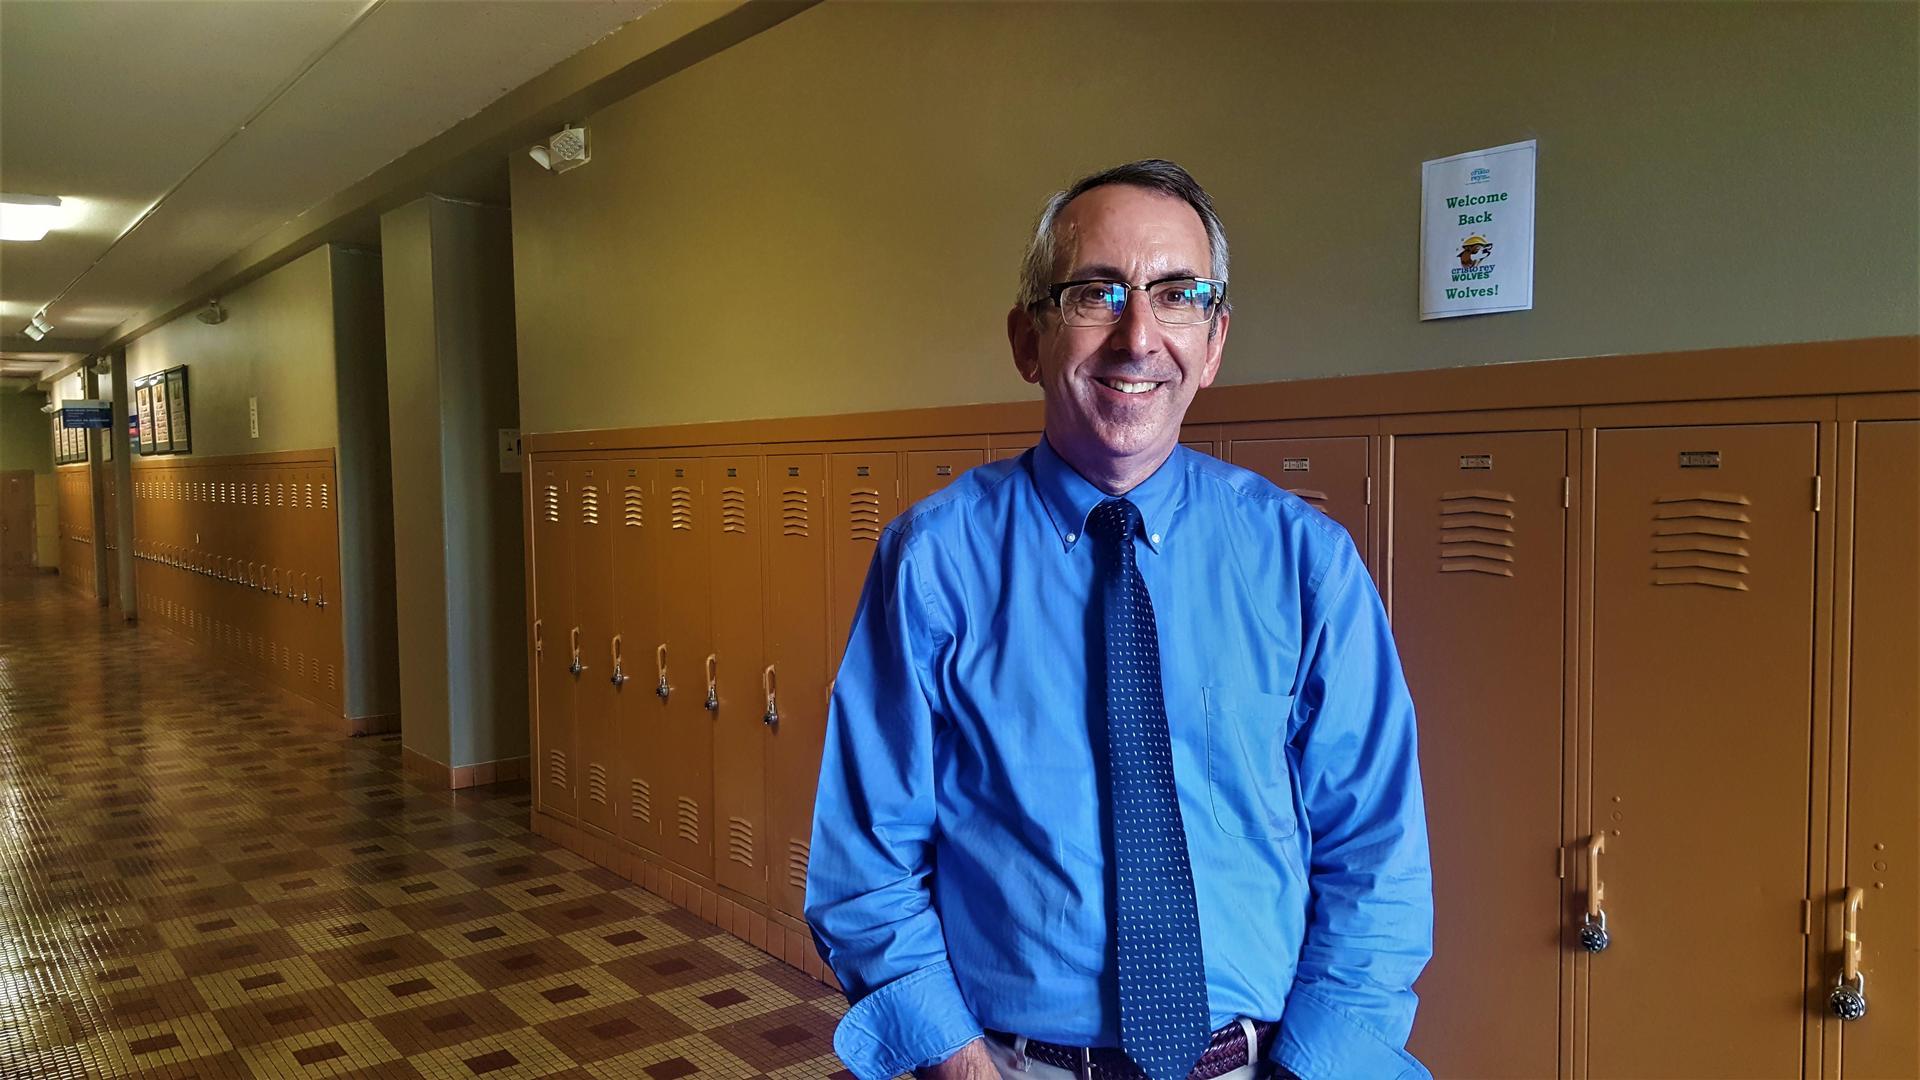 Michael Khoury, President